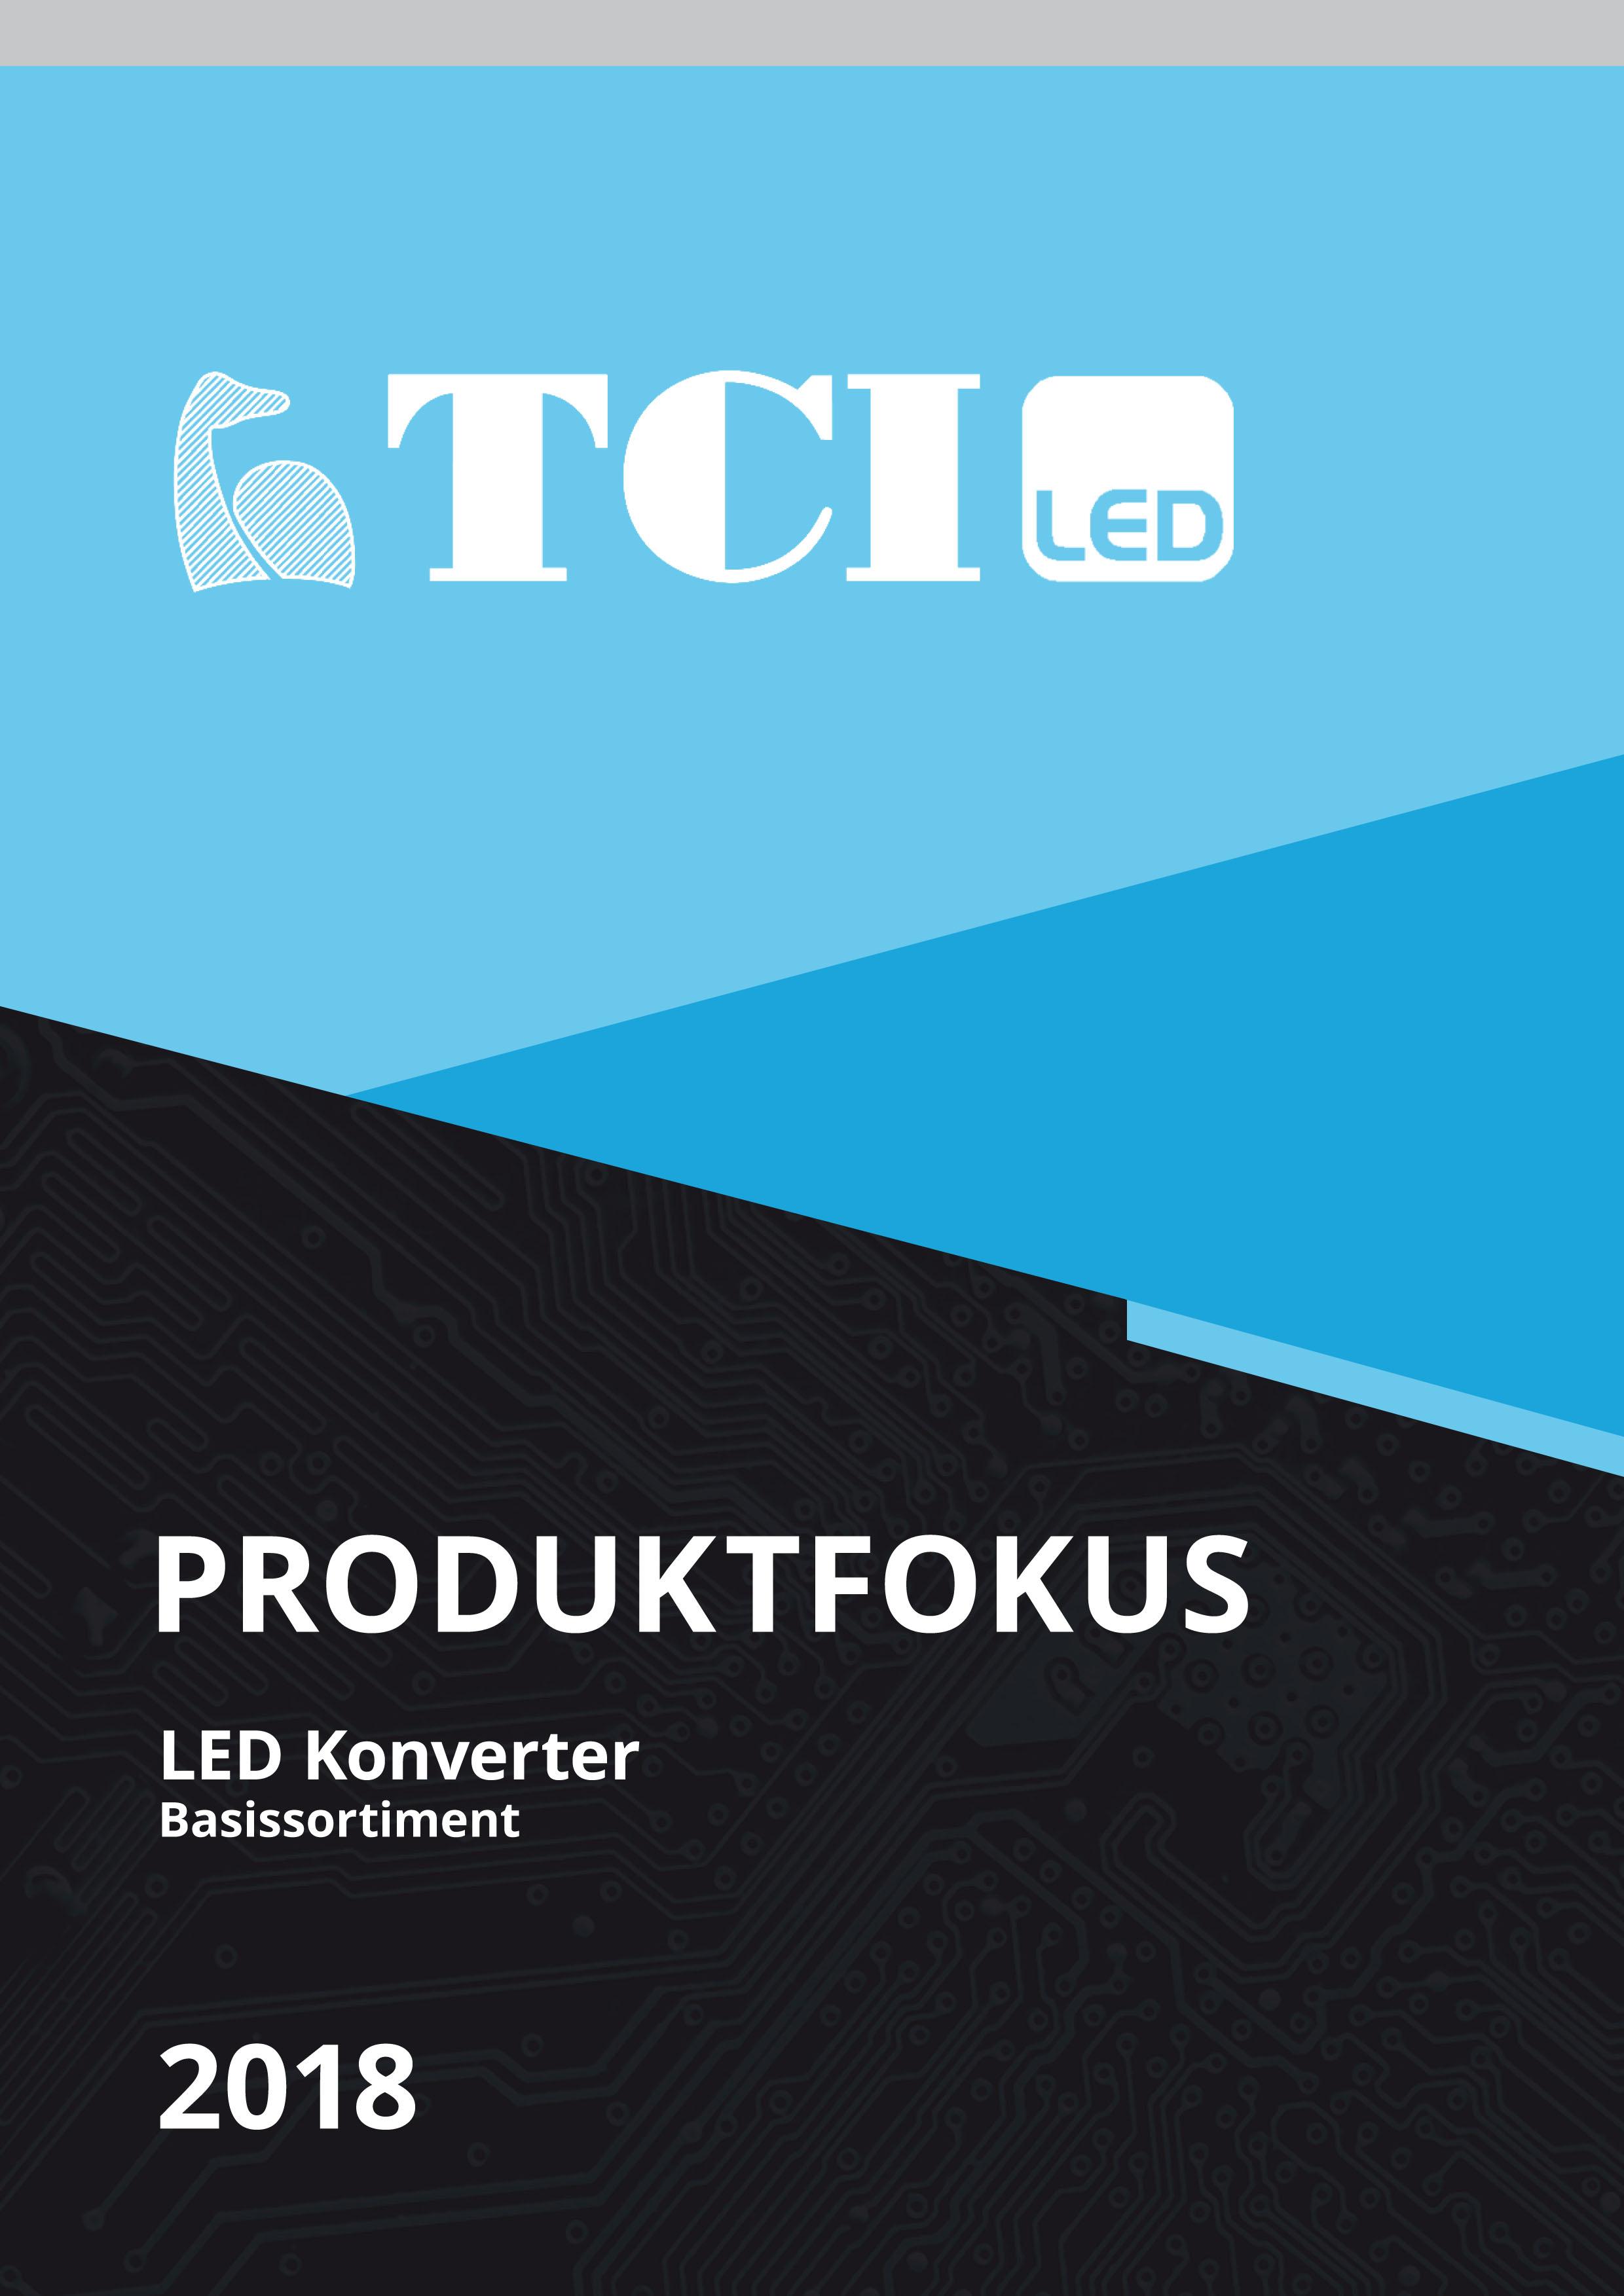 TCI Produktfokus 2018